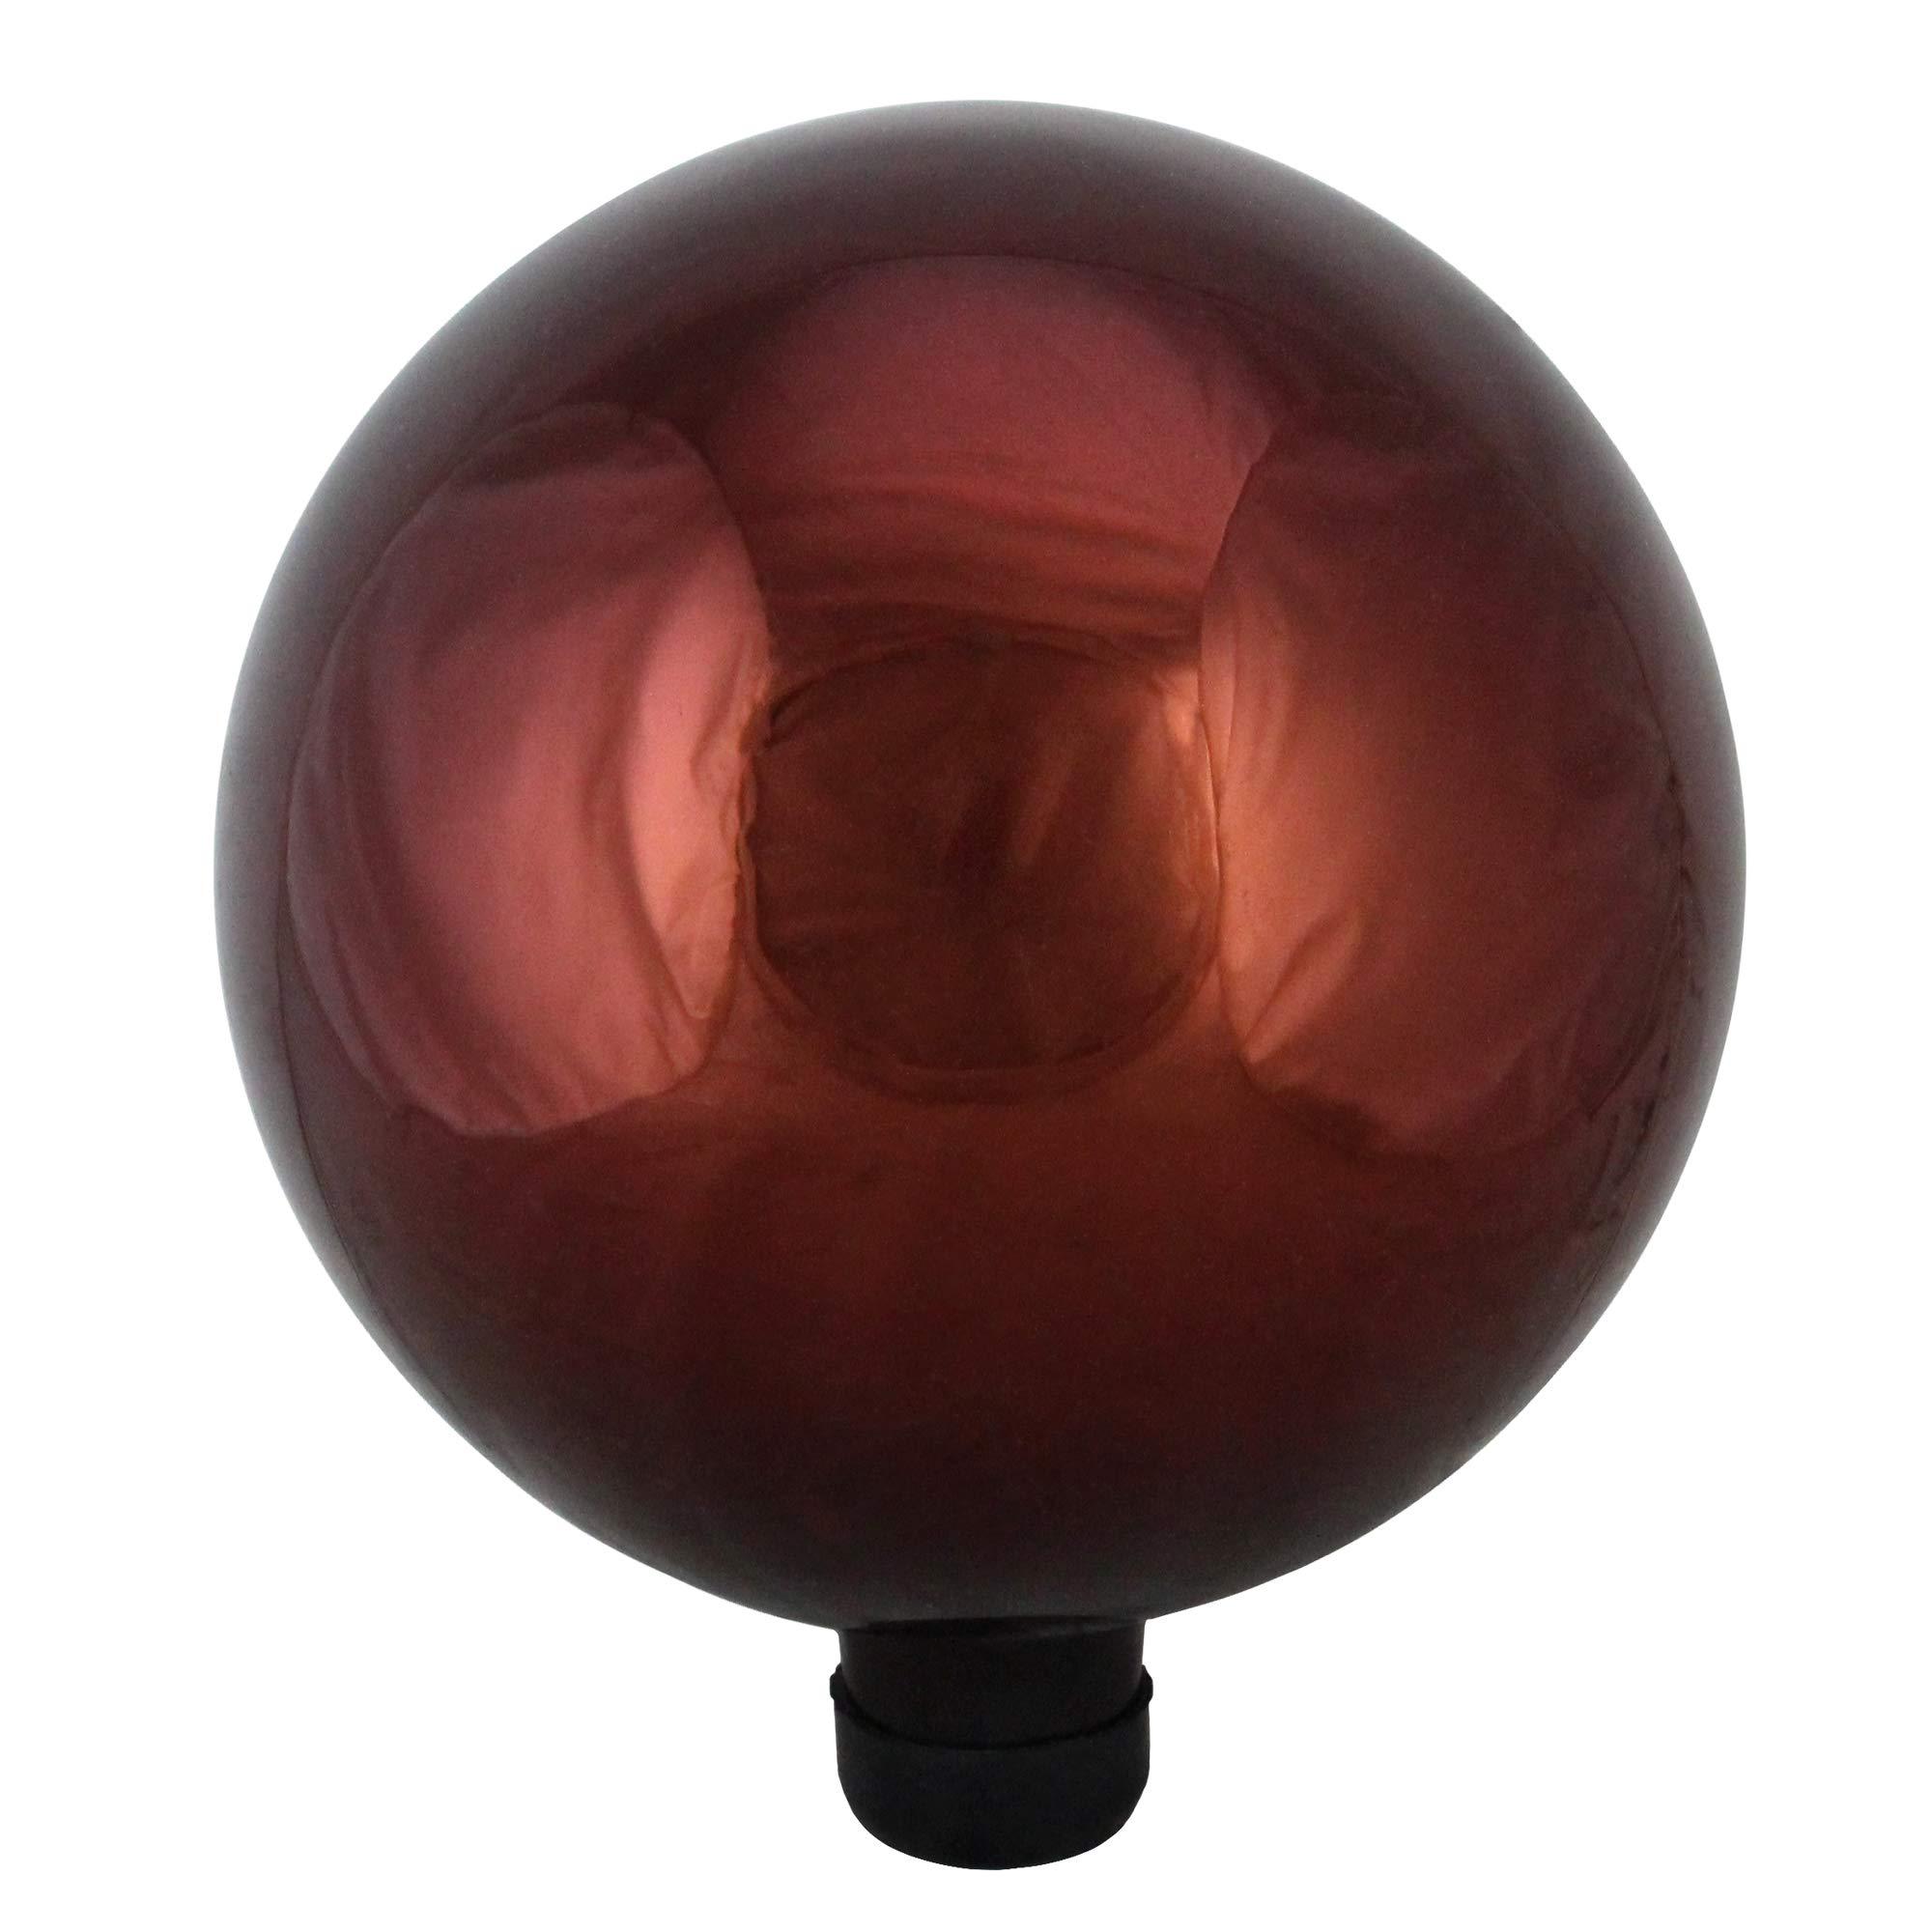 Northlight 10'' Shiny Berry Red Outdoor Patio Garden Gazing Ball